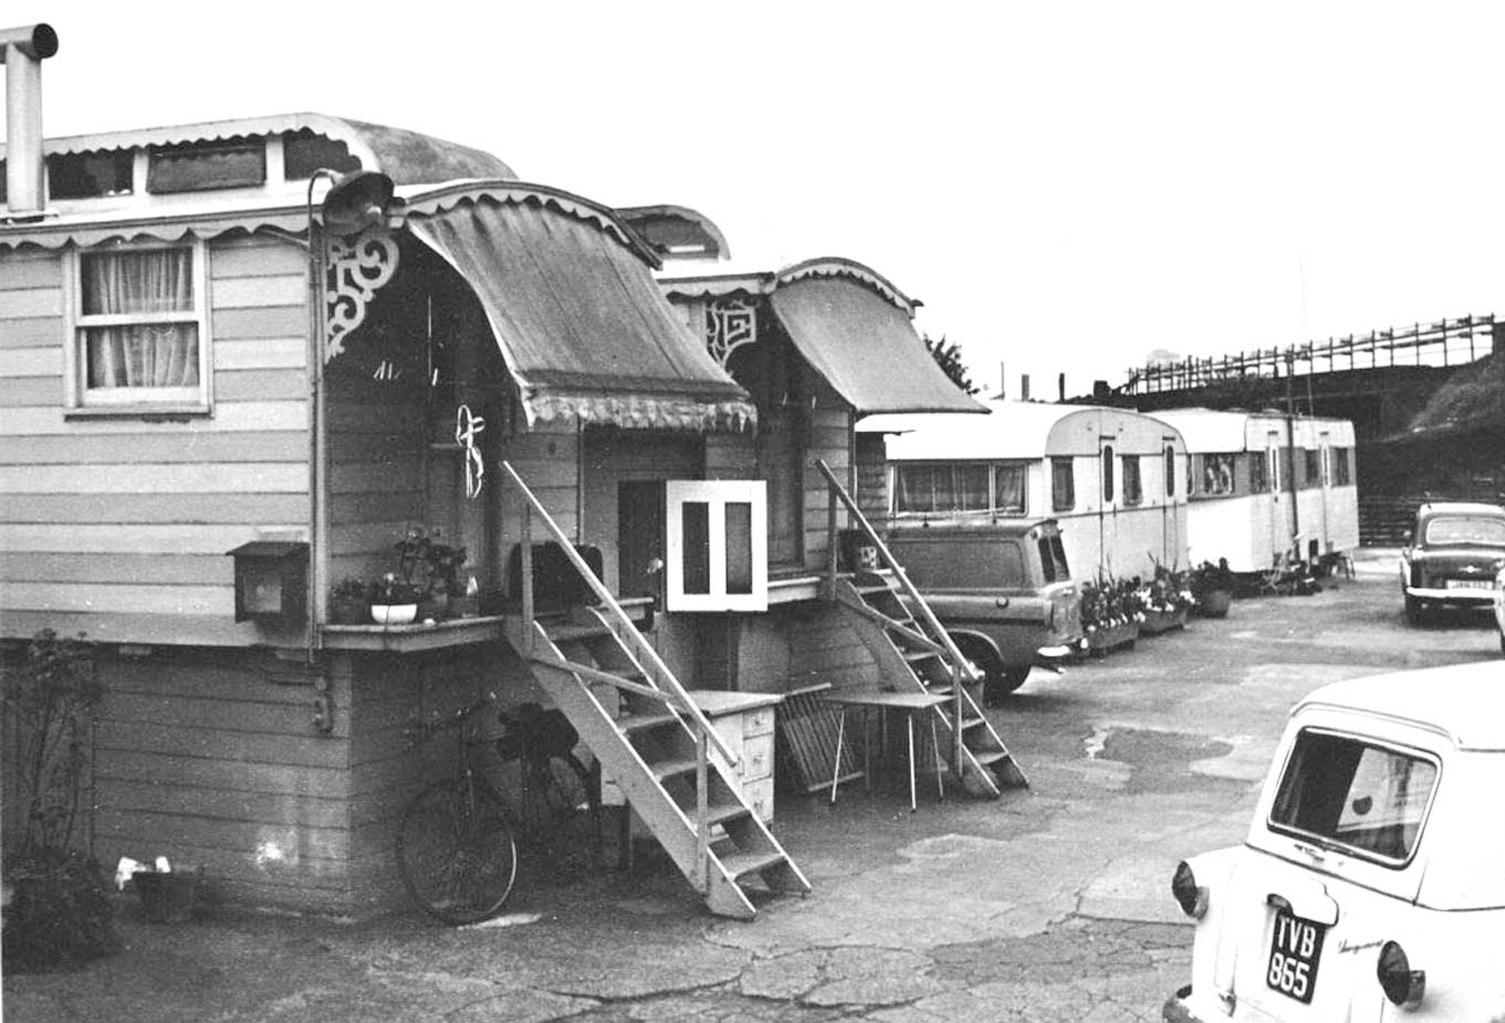 Black and white photo of traveller caravans in Mills' Yard, Battersea